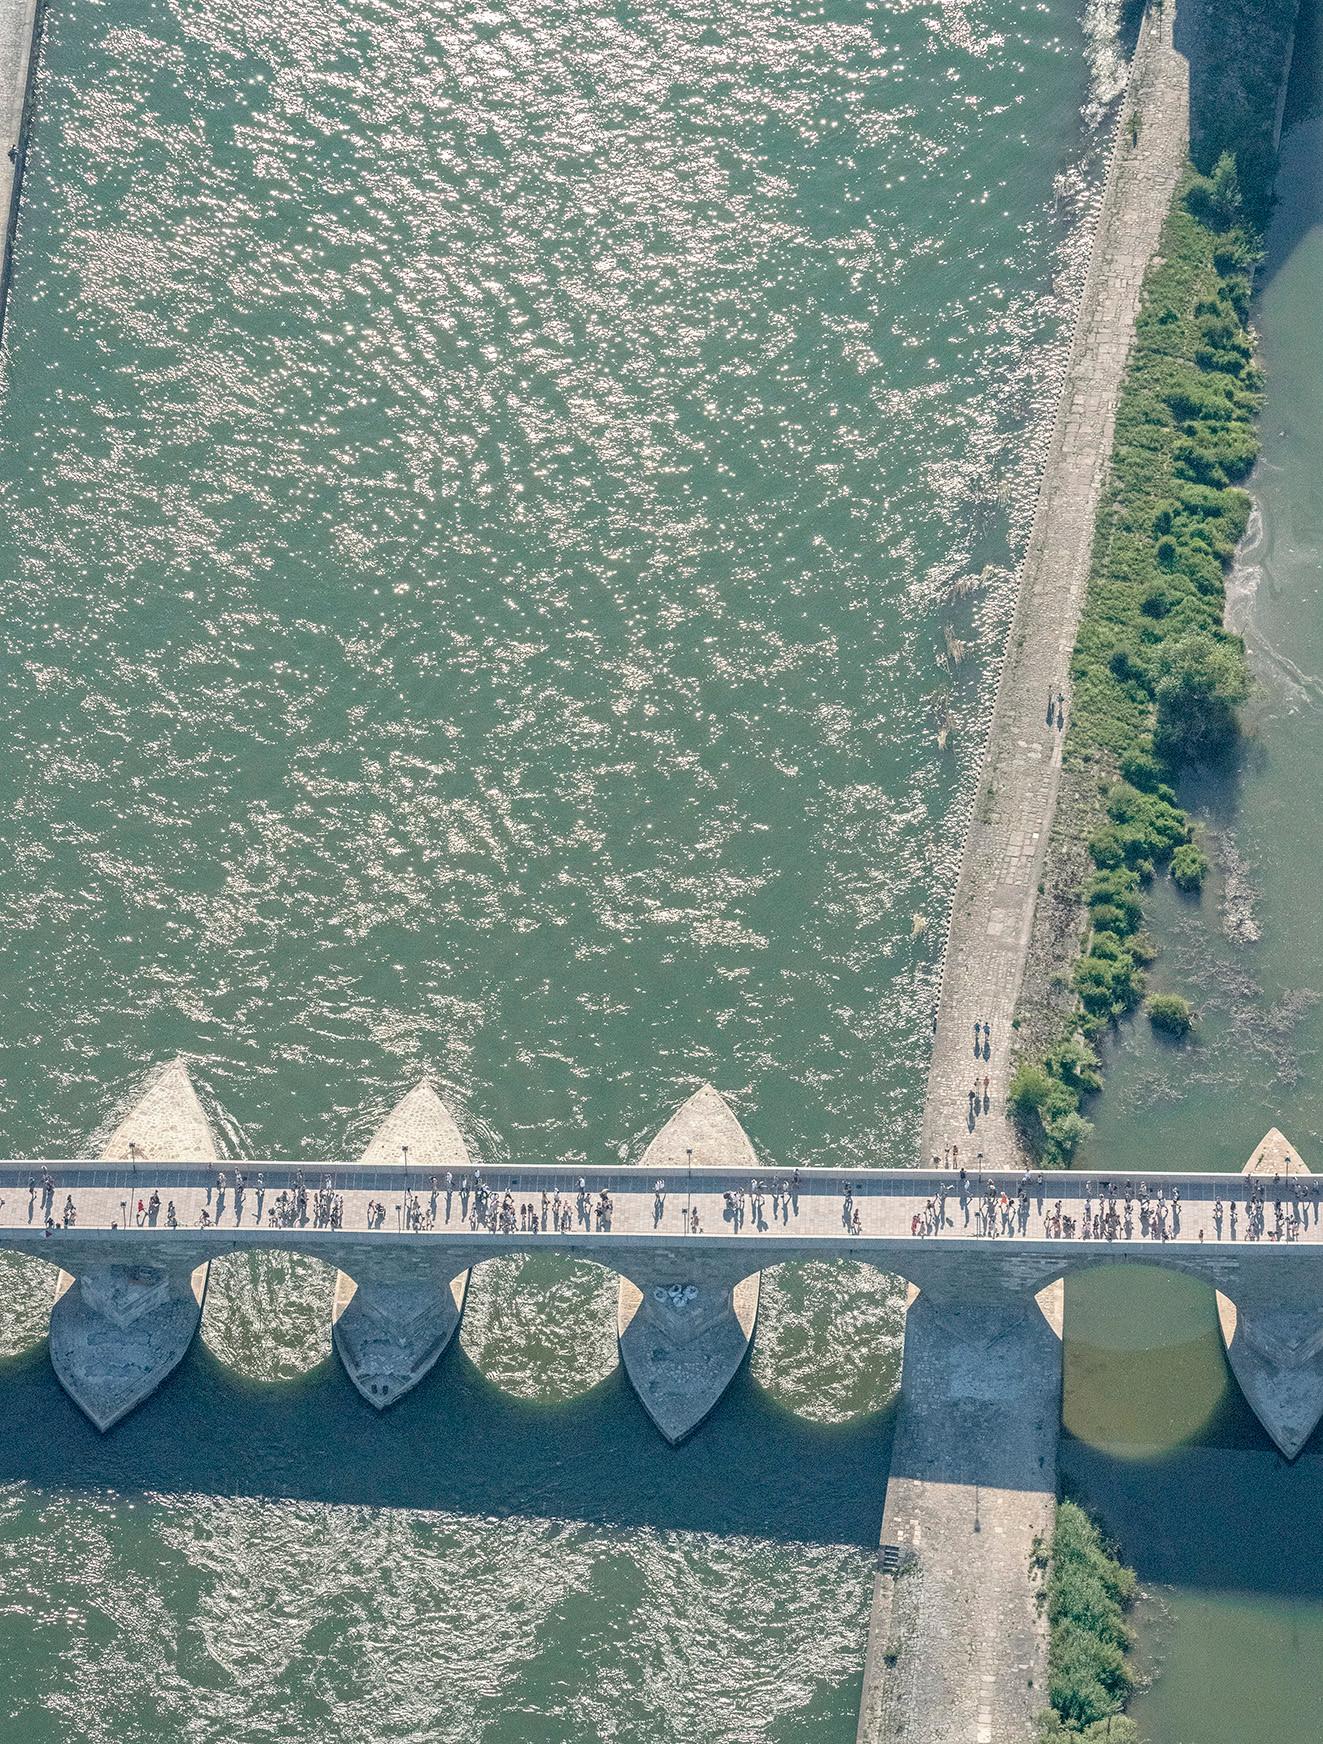 Steinerne Brücke, Am Beschlächt